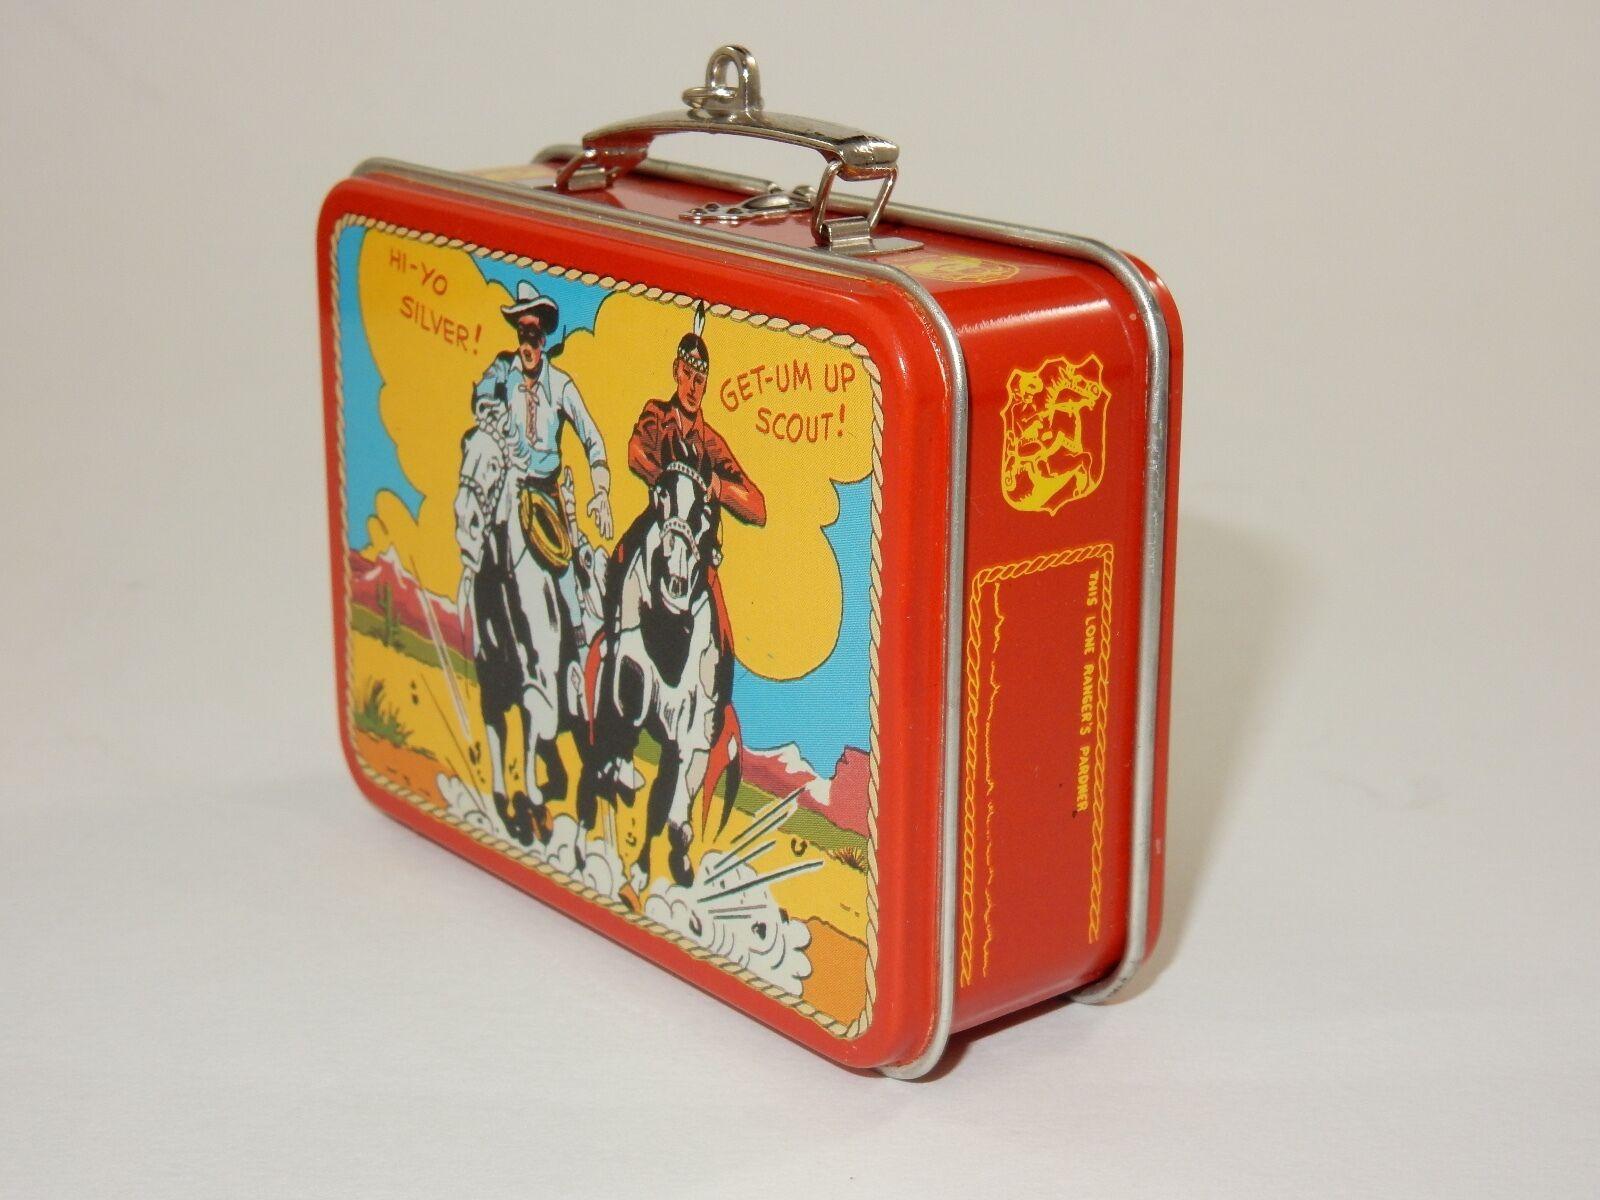 Hallmark 1997 The Lone Ranger Mini Tin Lunchbox Keepsake Ornament